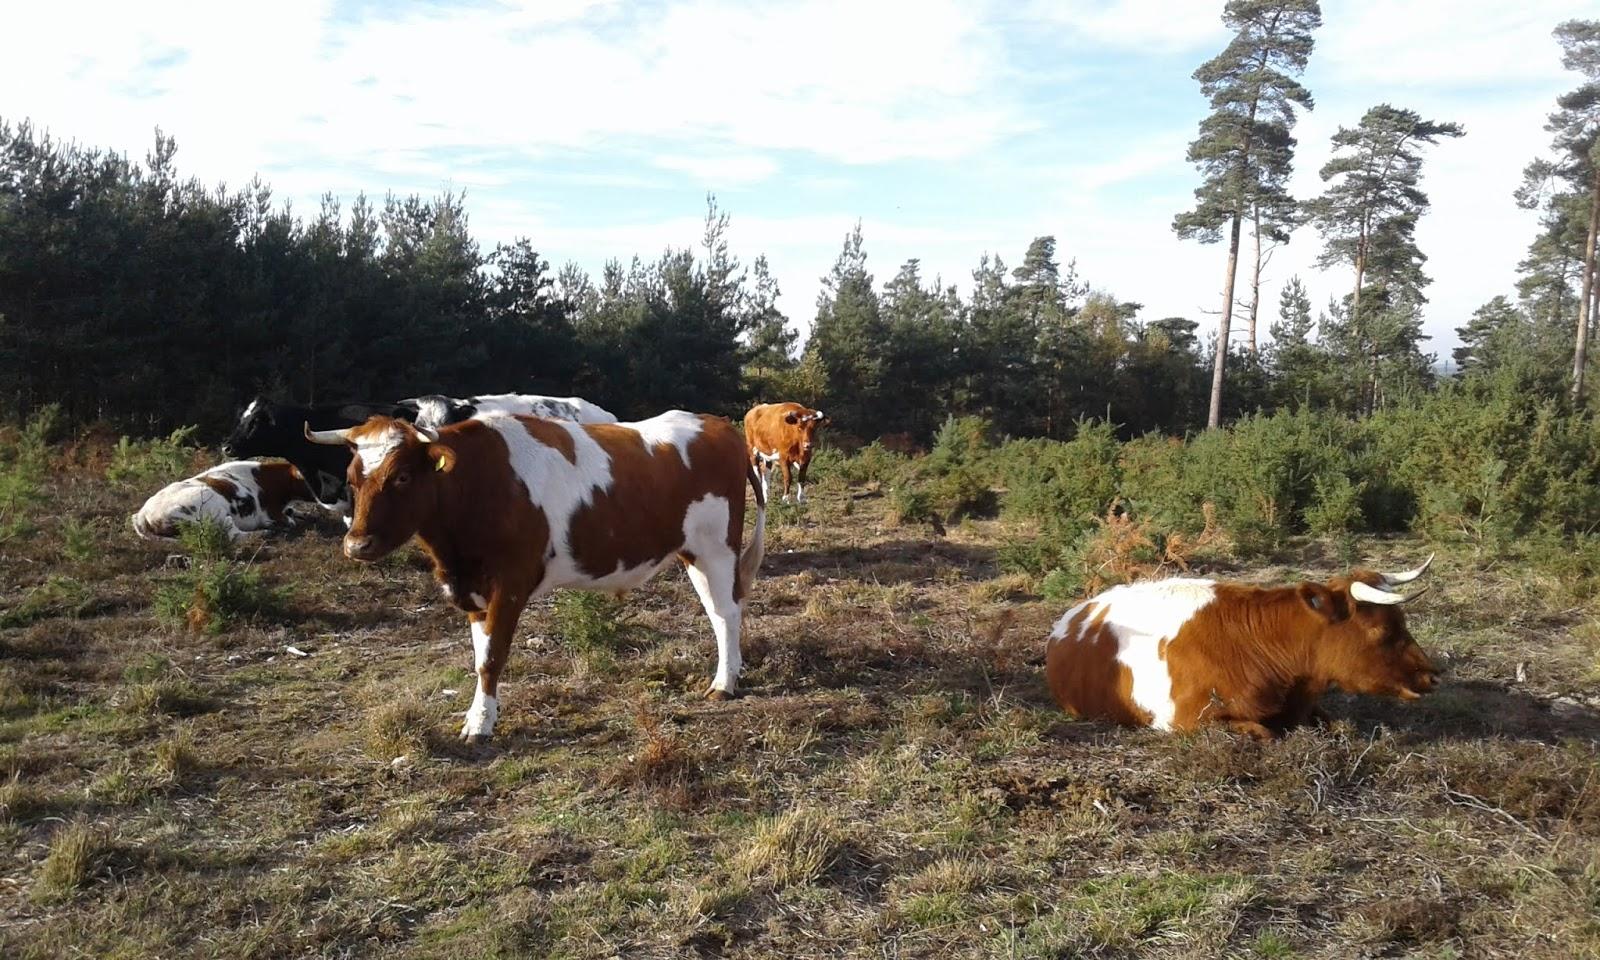 Cattle at Caesar's Camp (credit: Hampshire & Isle of Wight Wildlife Trust)